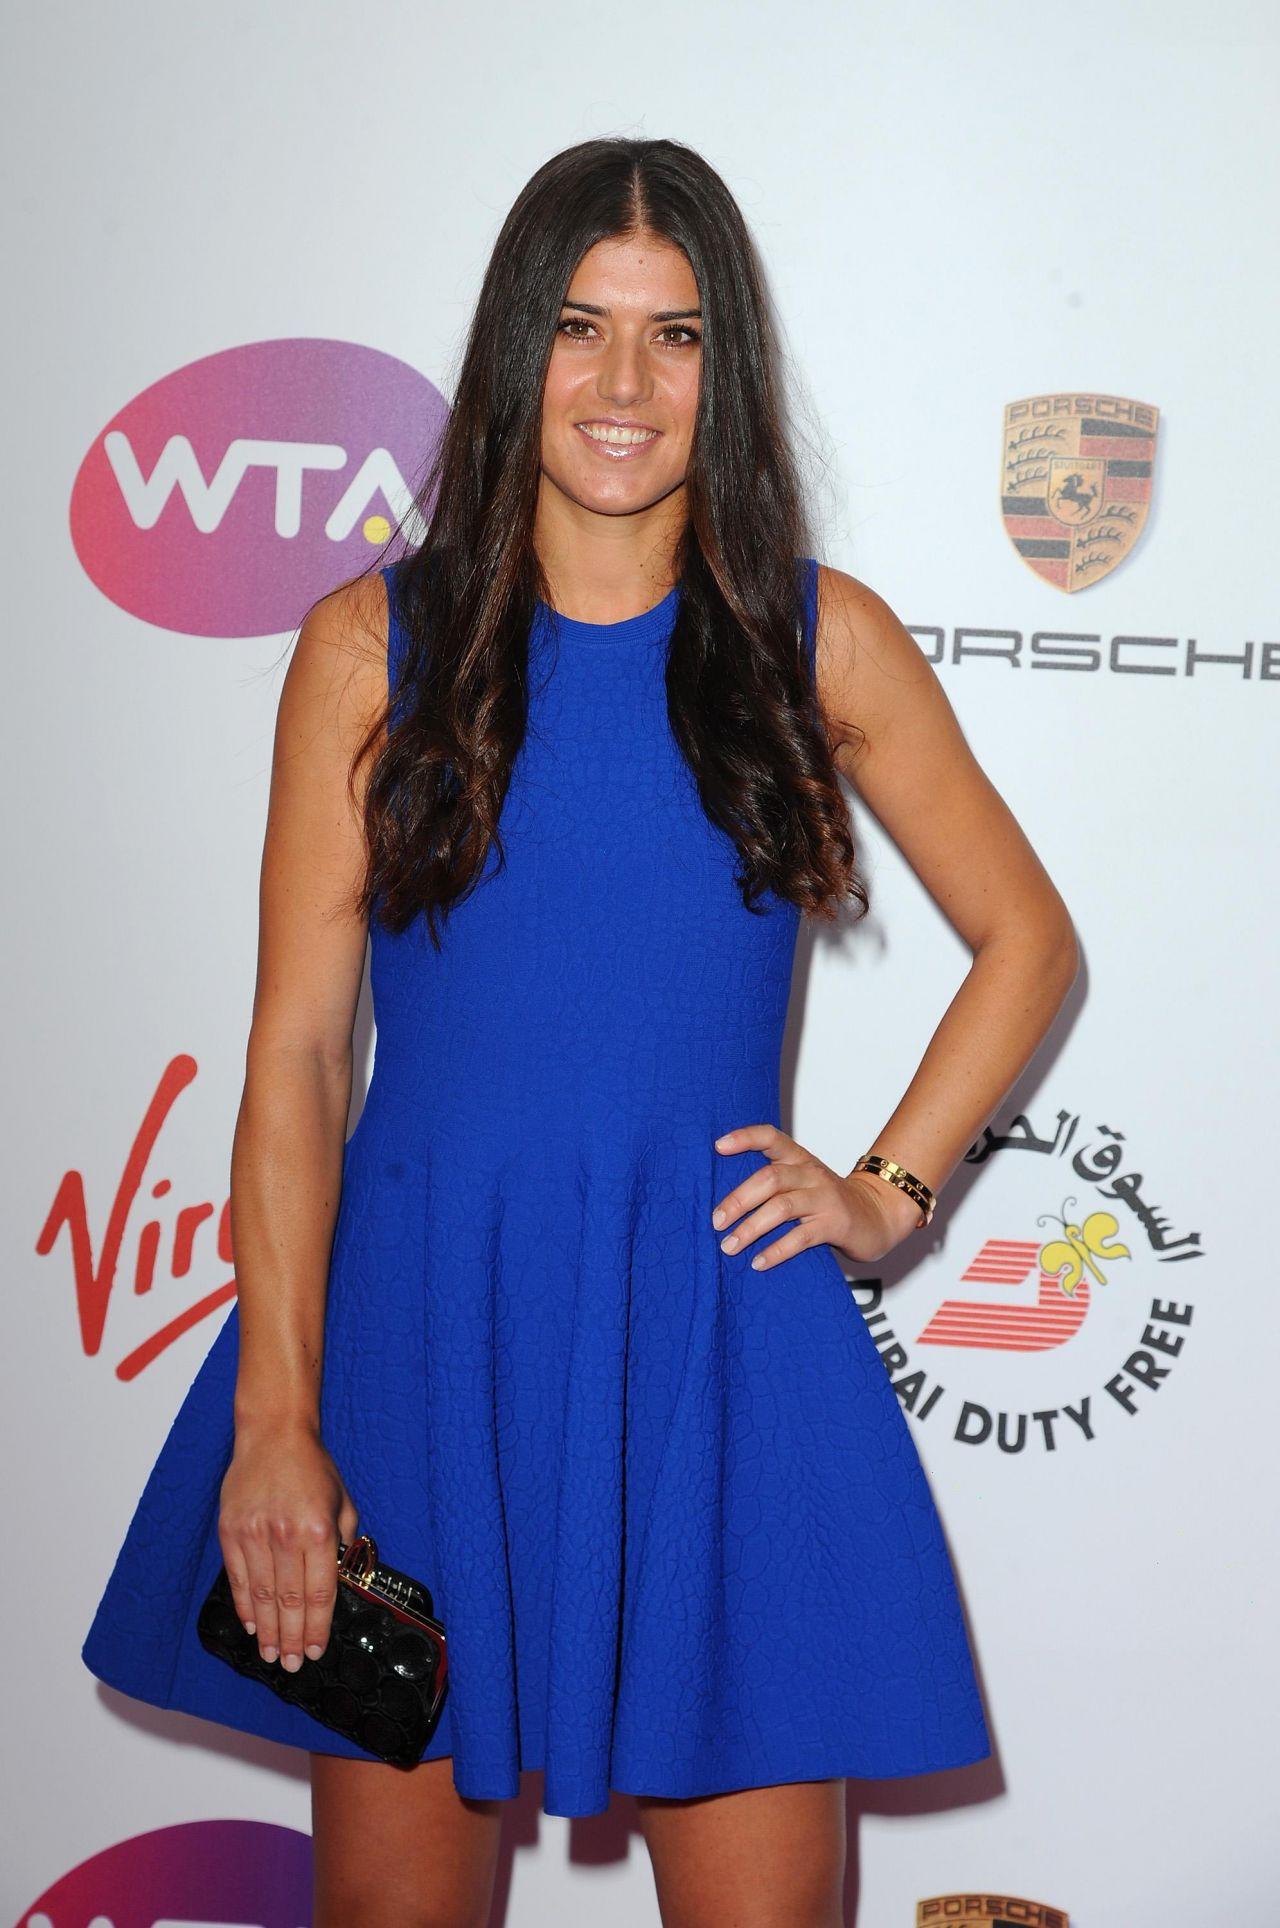 Sorana Cirstea 2014 Wta Pre Wimbledon Party At